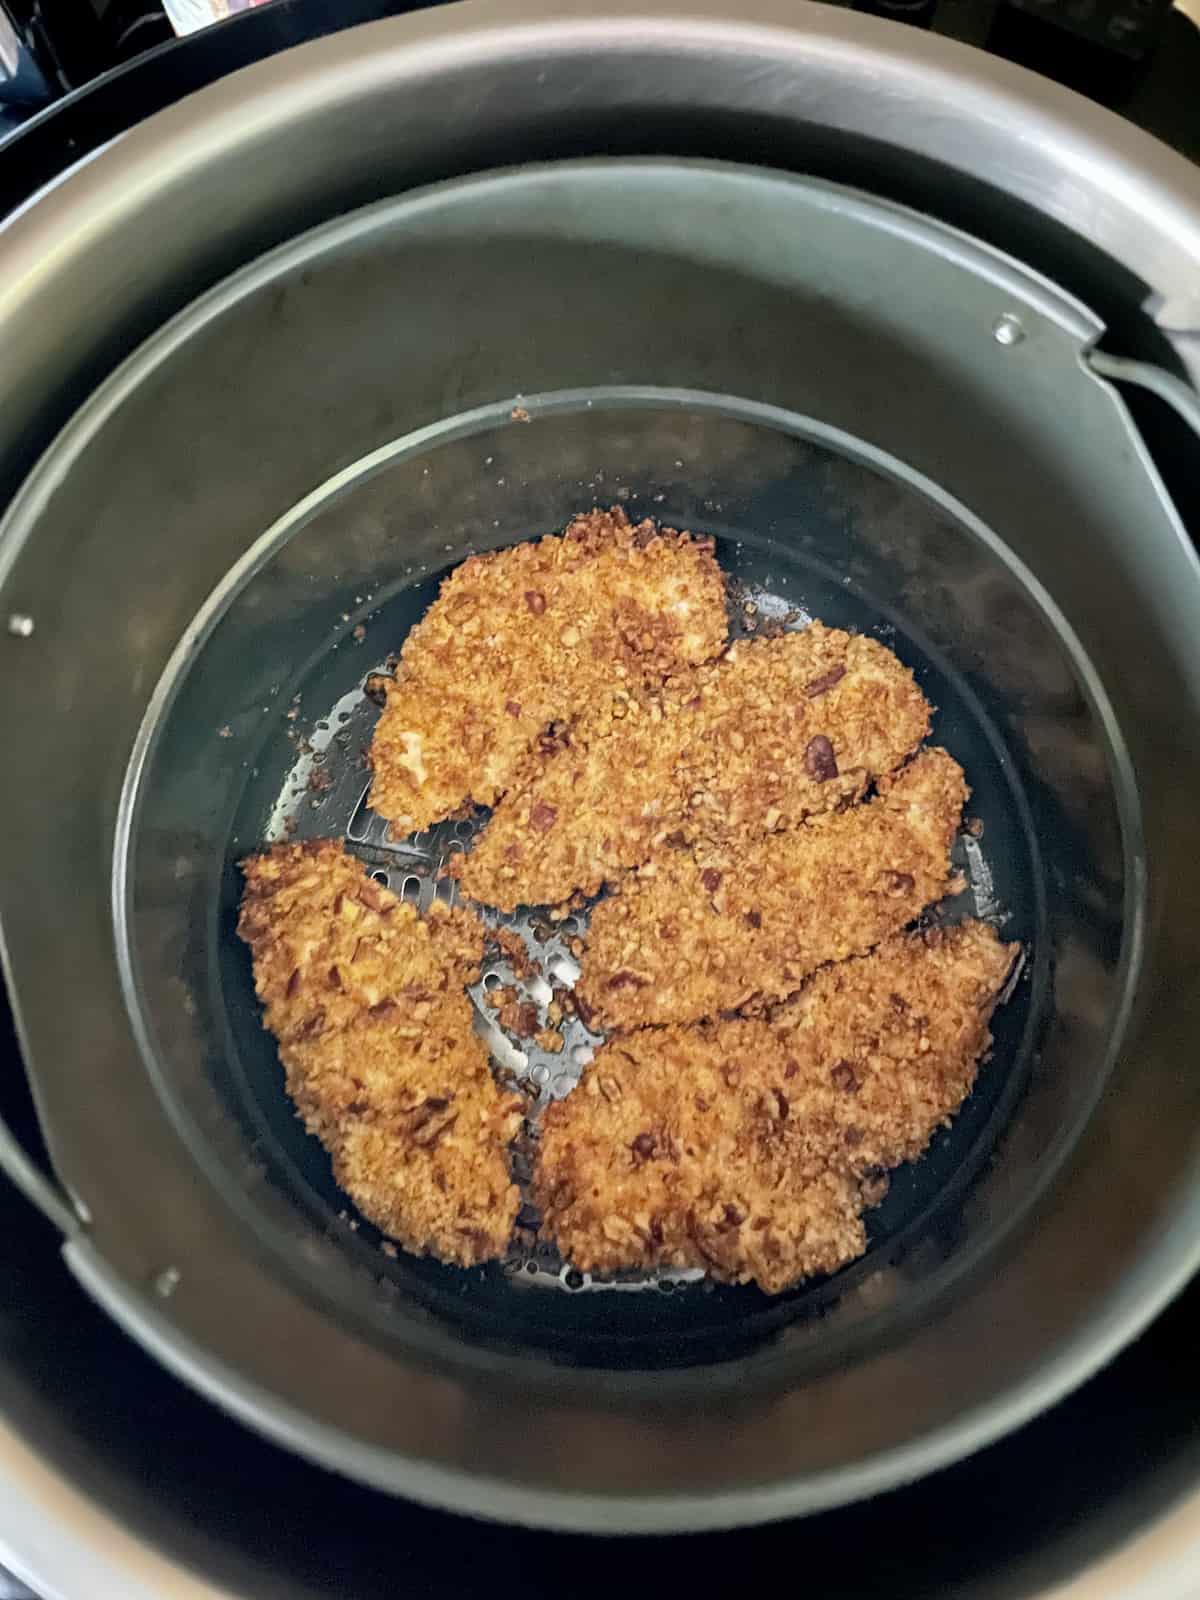 air fryer pecan crusted chicken in the basket